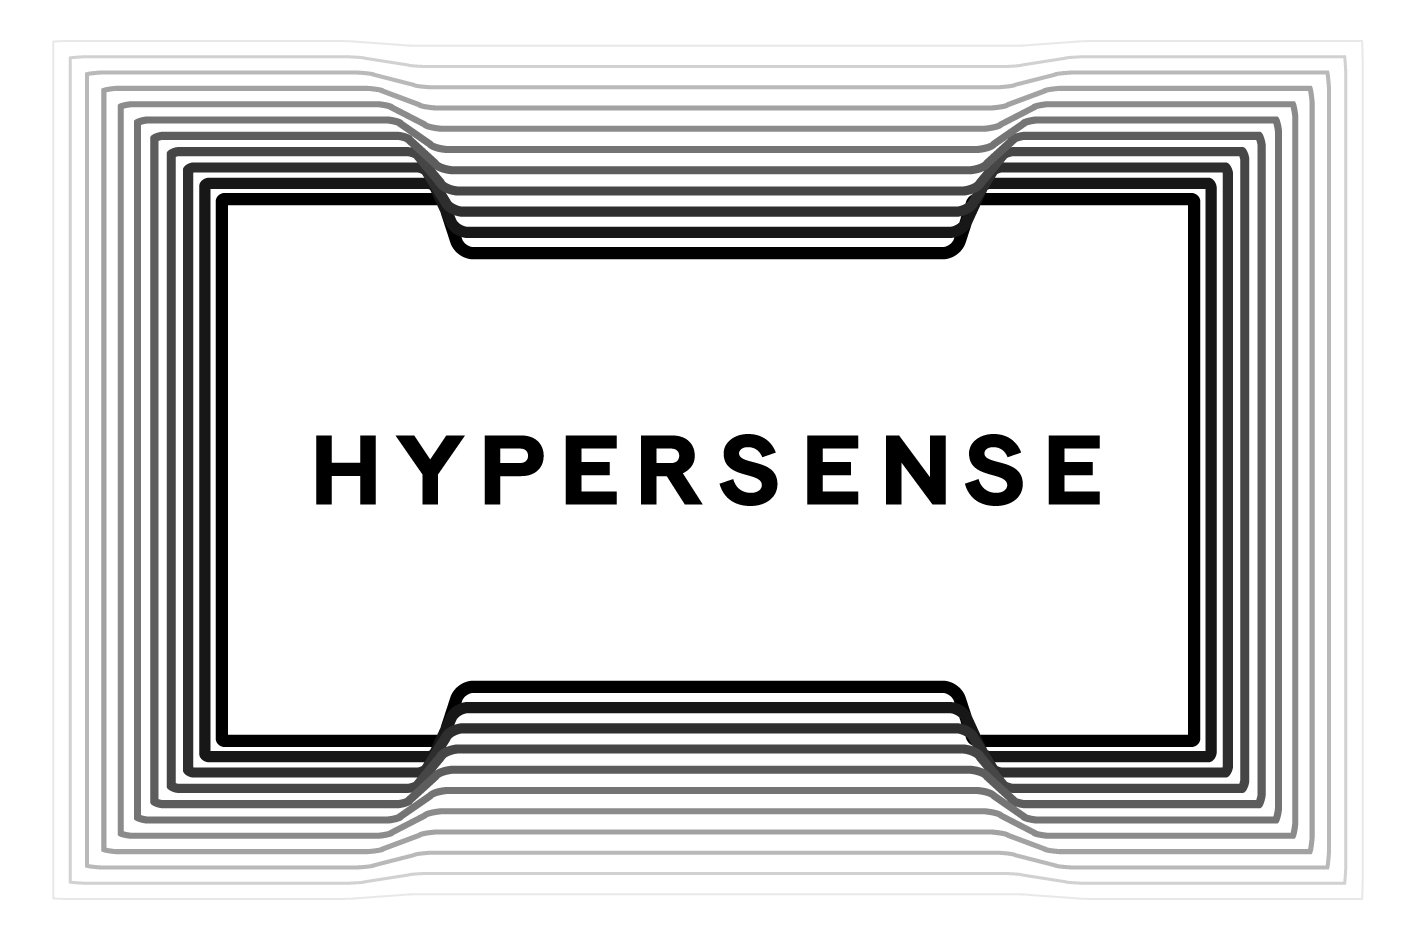 HYPERSENSE